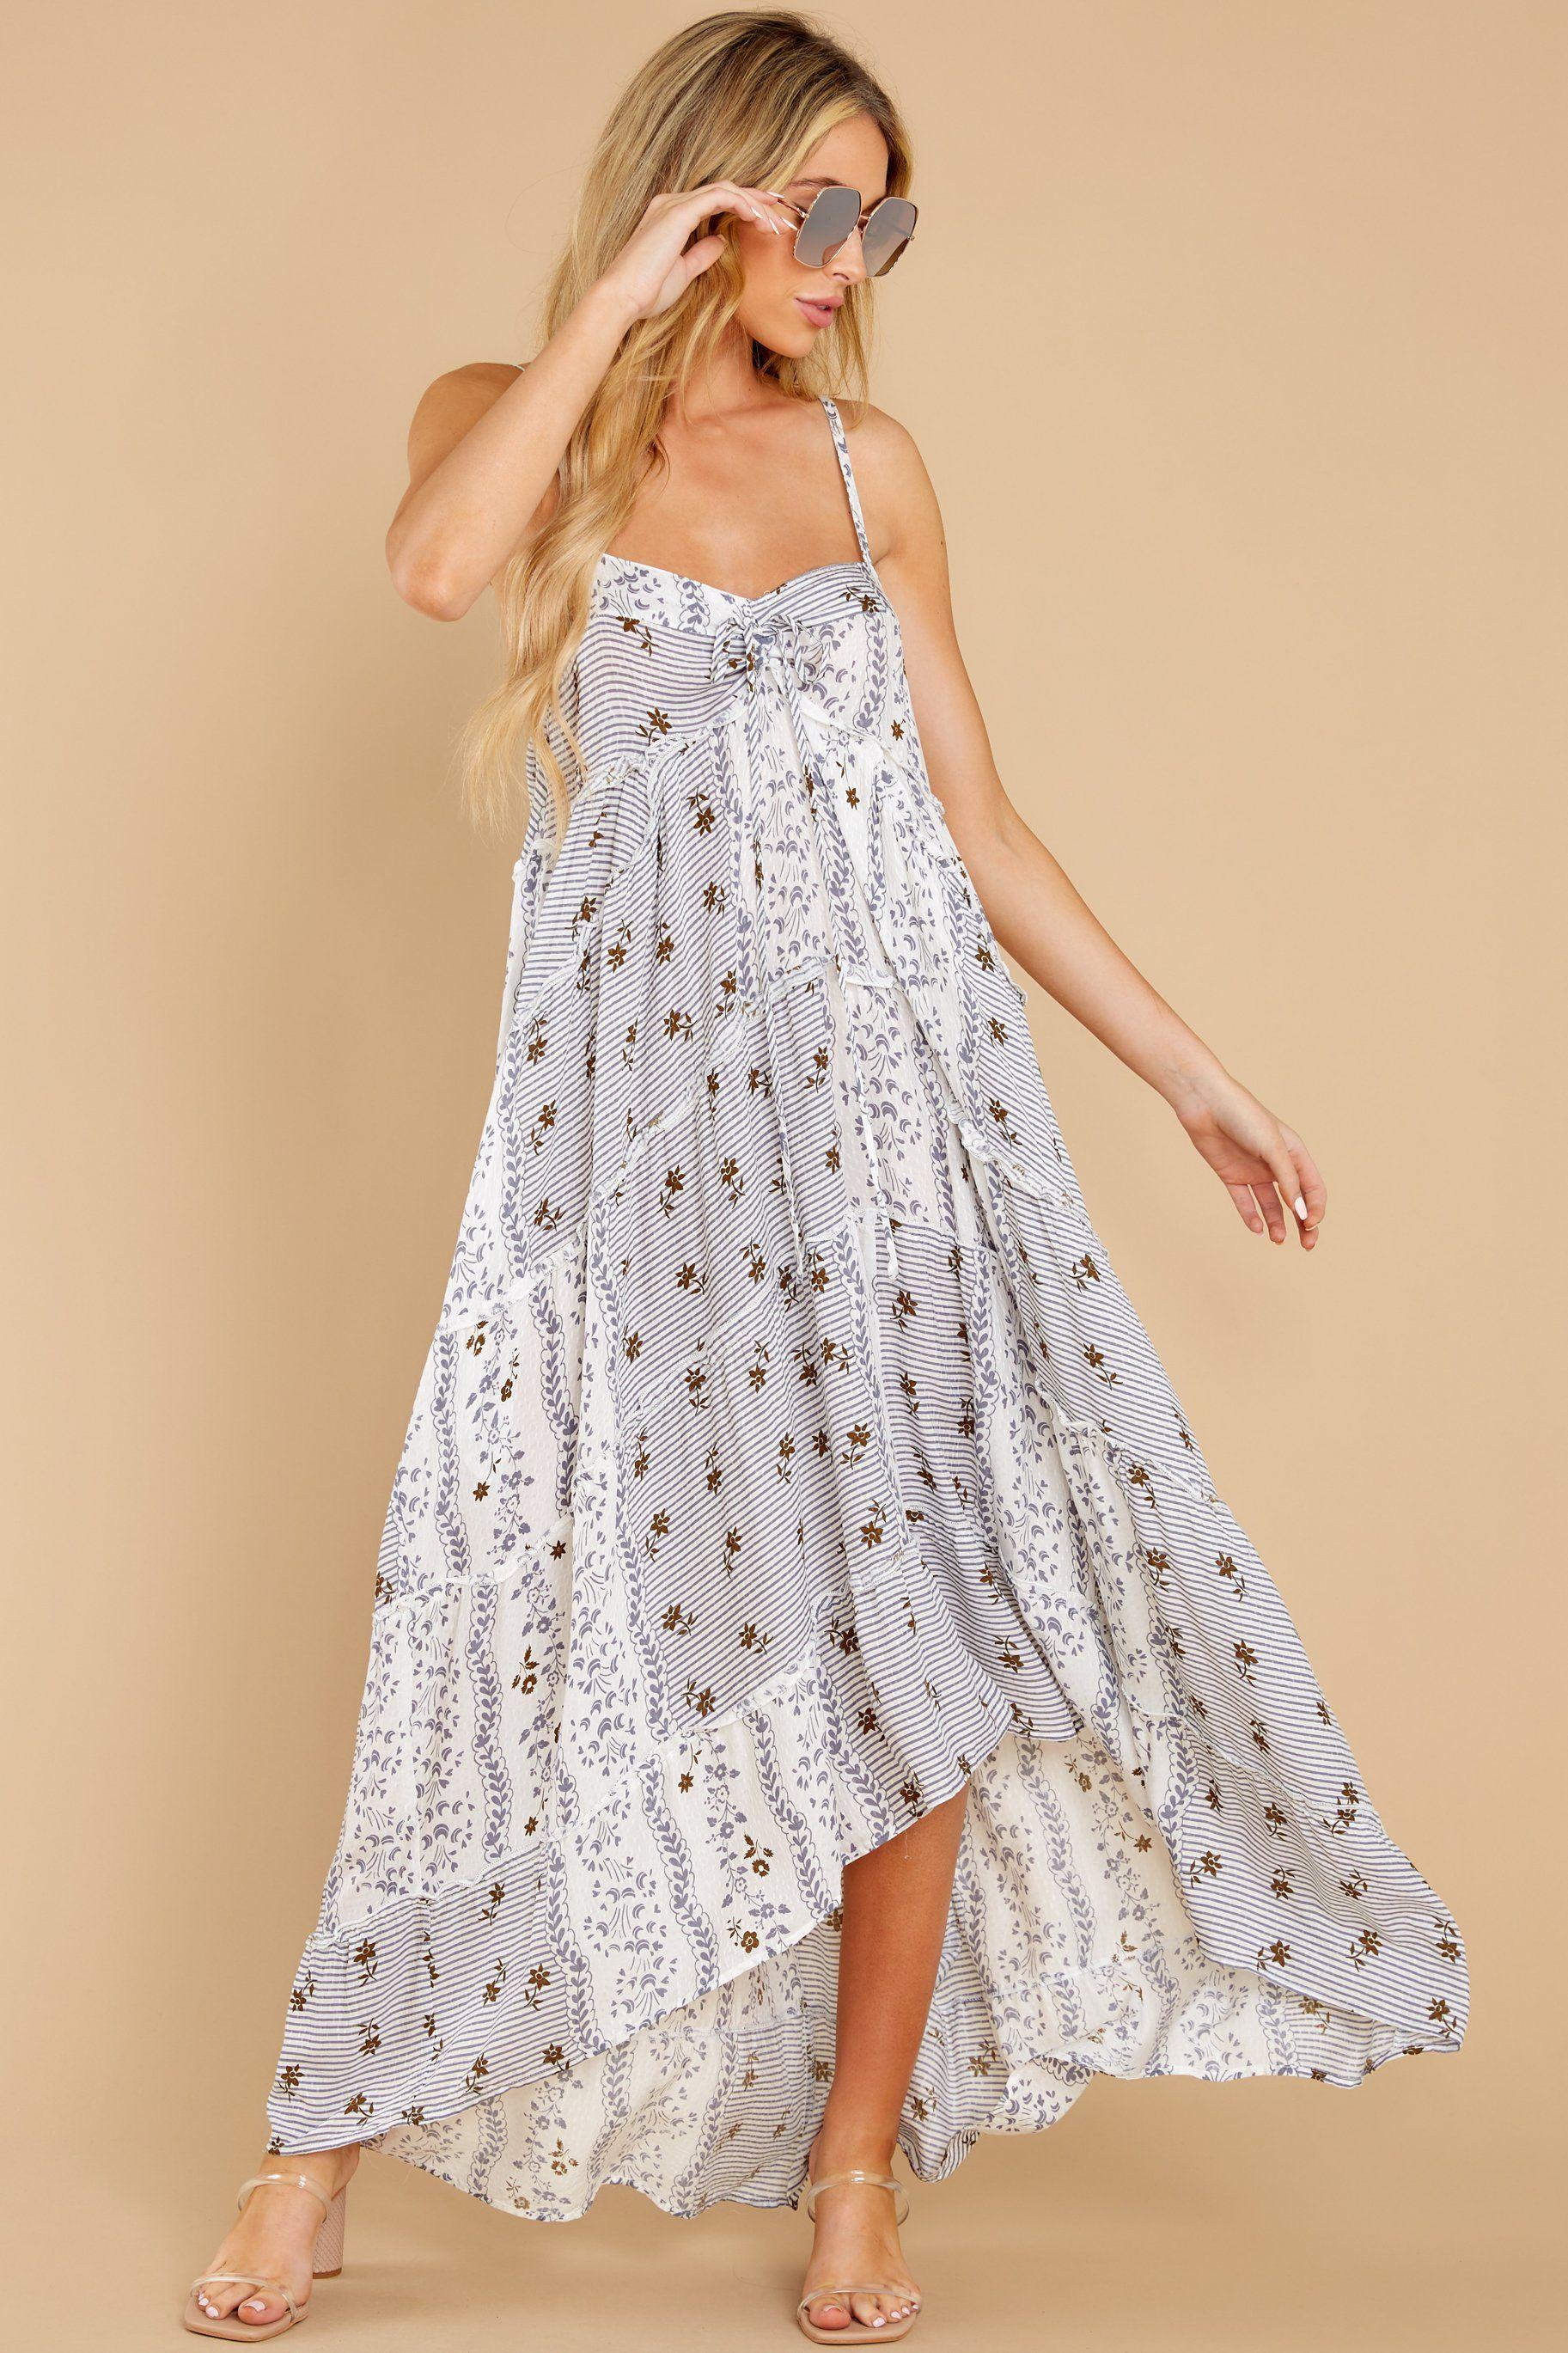 Boho White Dress Scrunched Sweetheart Maxi Dress Dress 62 00 Printed Maxi Dress White Boho Dress Maxi Dress [ 2738 x 1825 Pixel ]